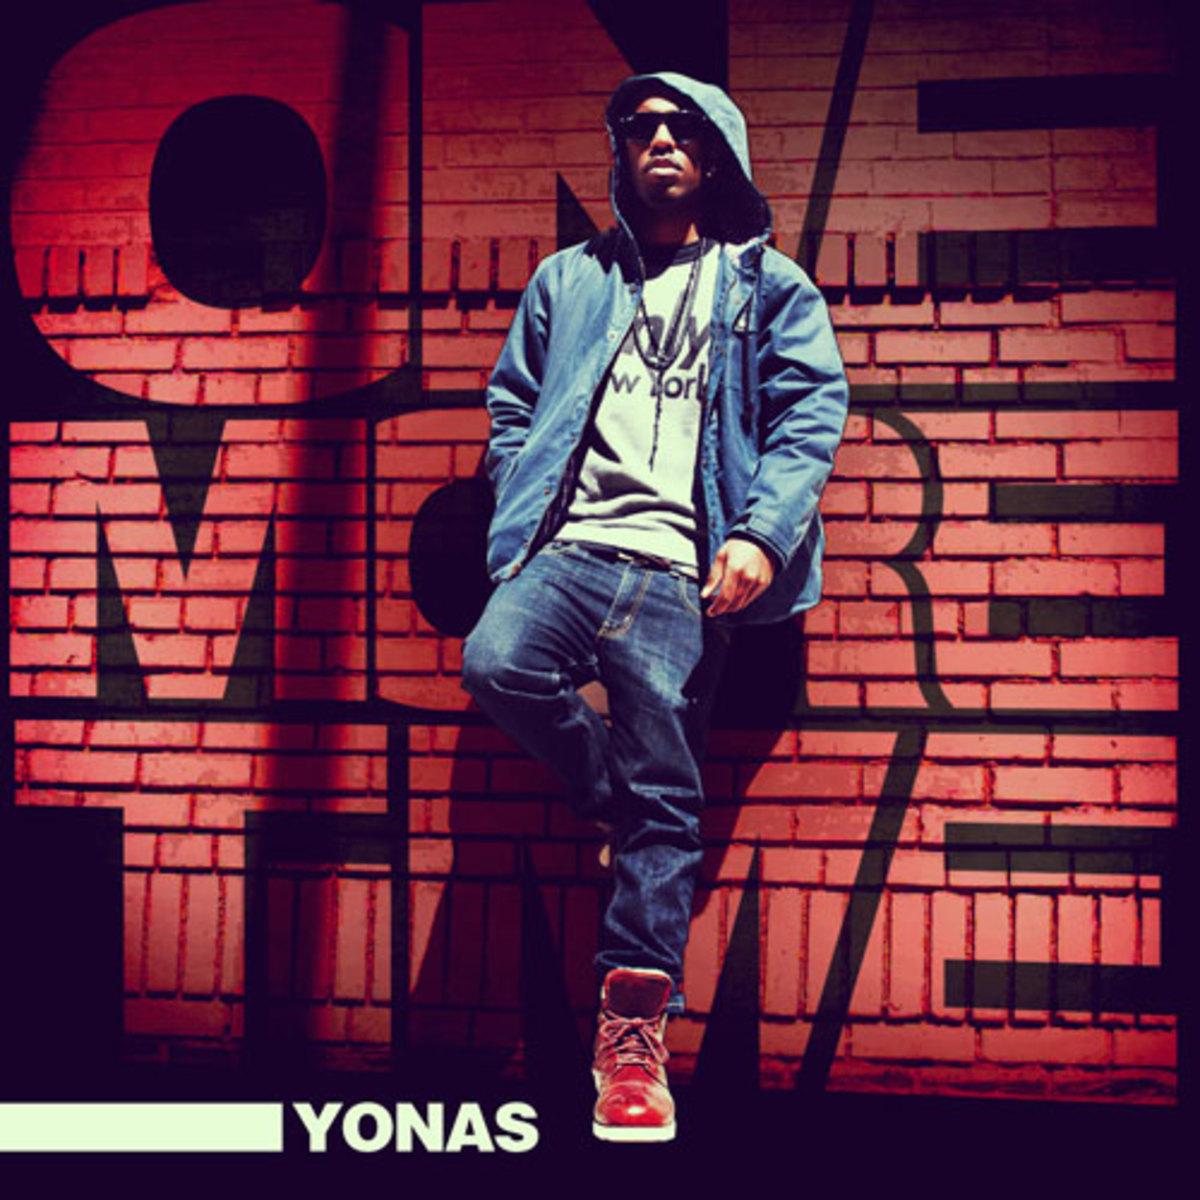 yonas-onemoretime.jpg